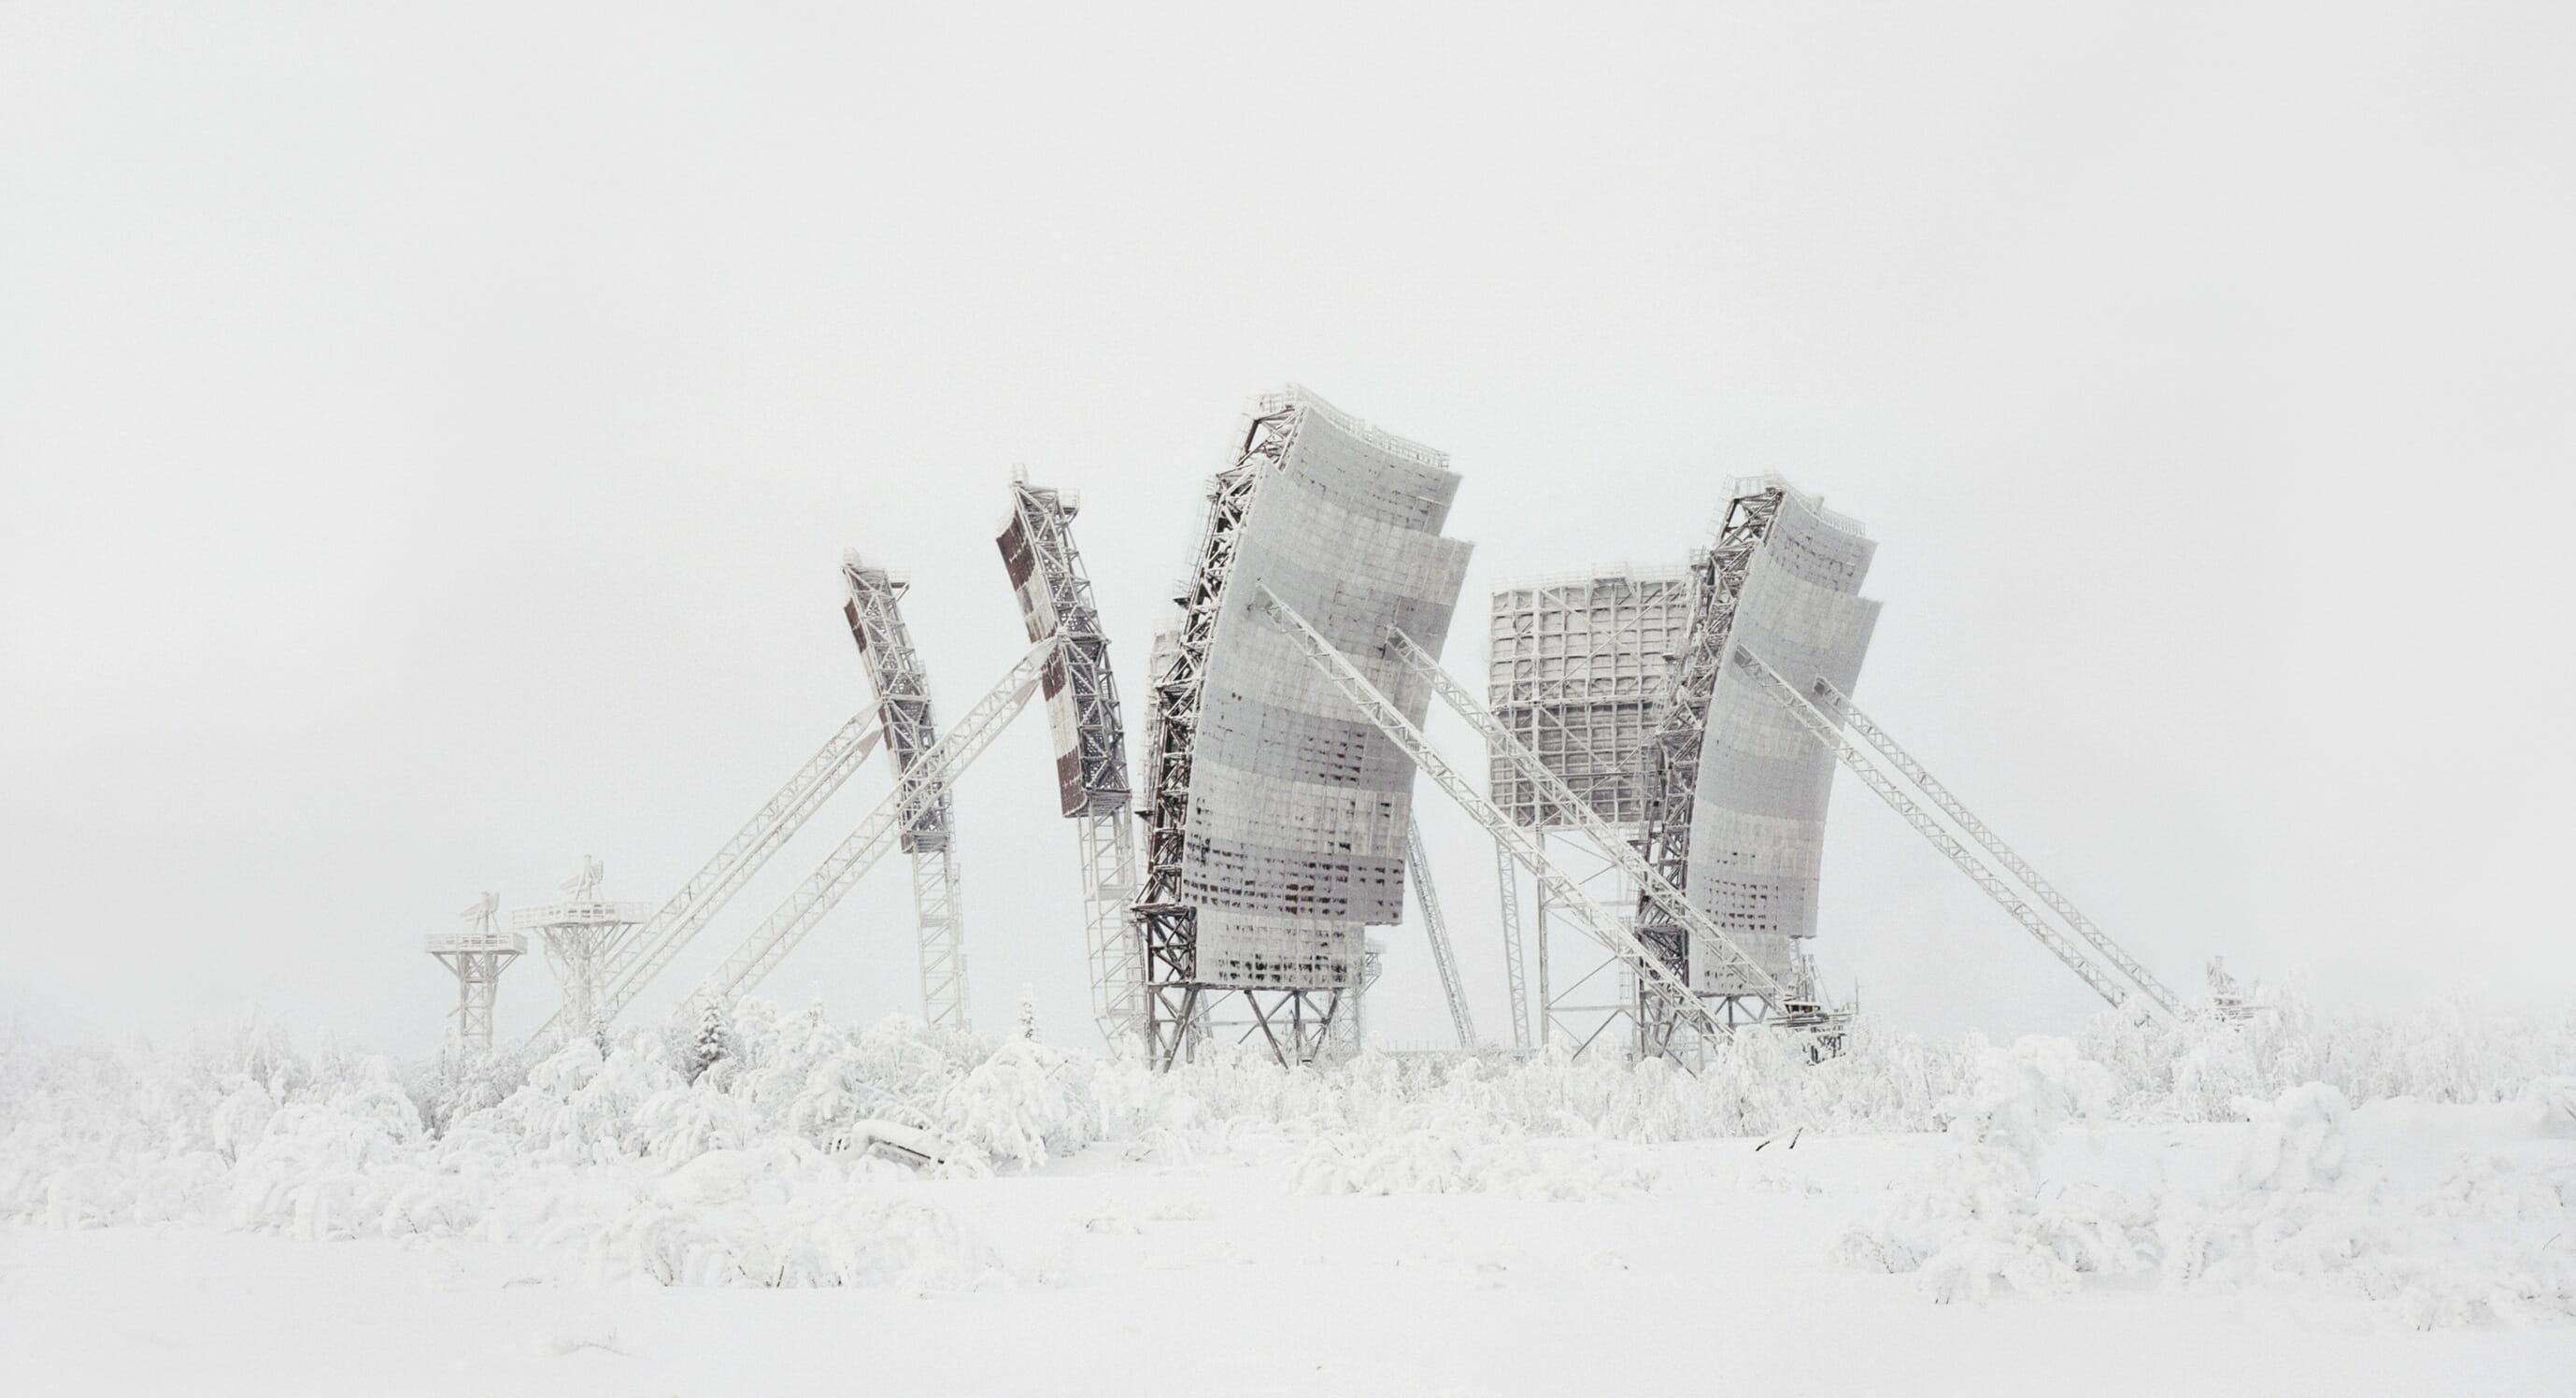 Danila Tkachenko's 'Restricted Areas' Shows The Stunning Remains Of Soviet-Era Technology